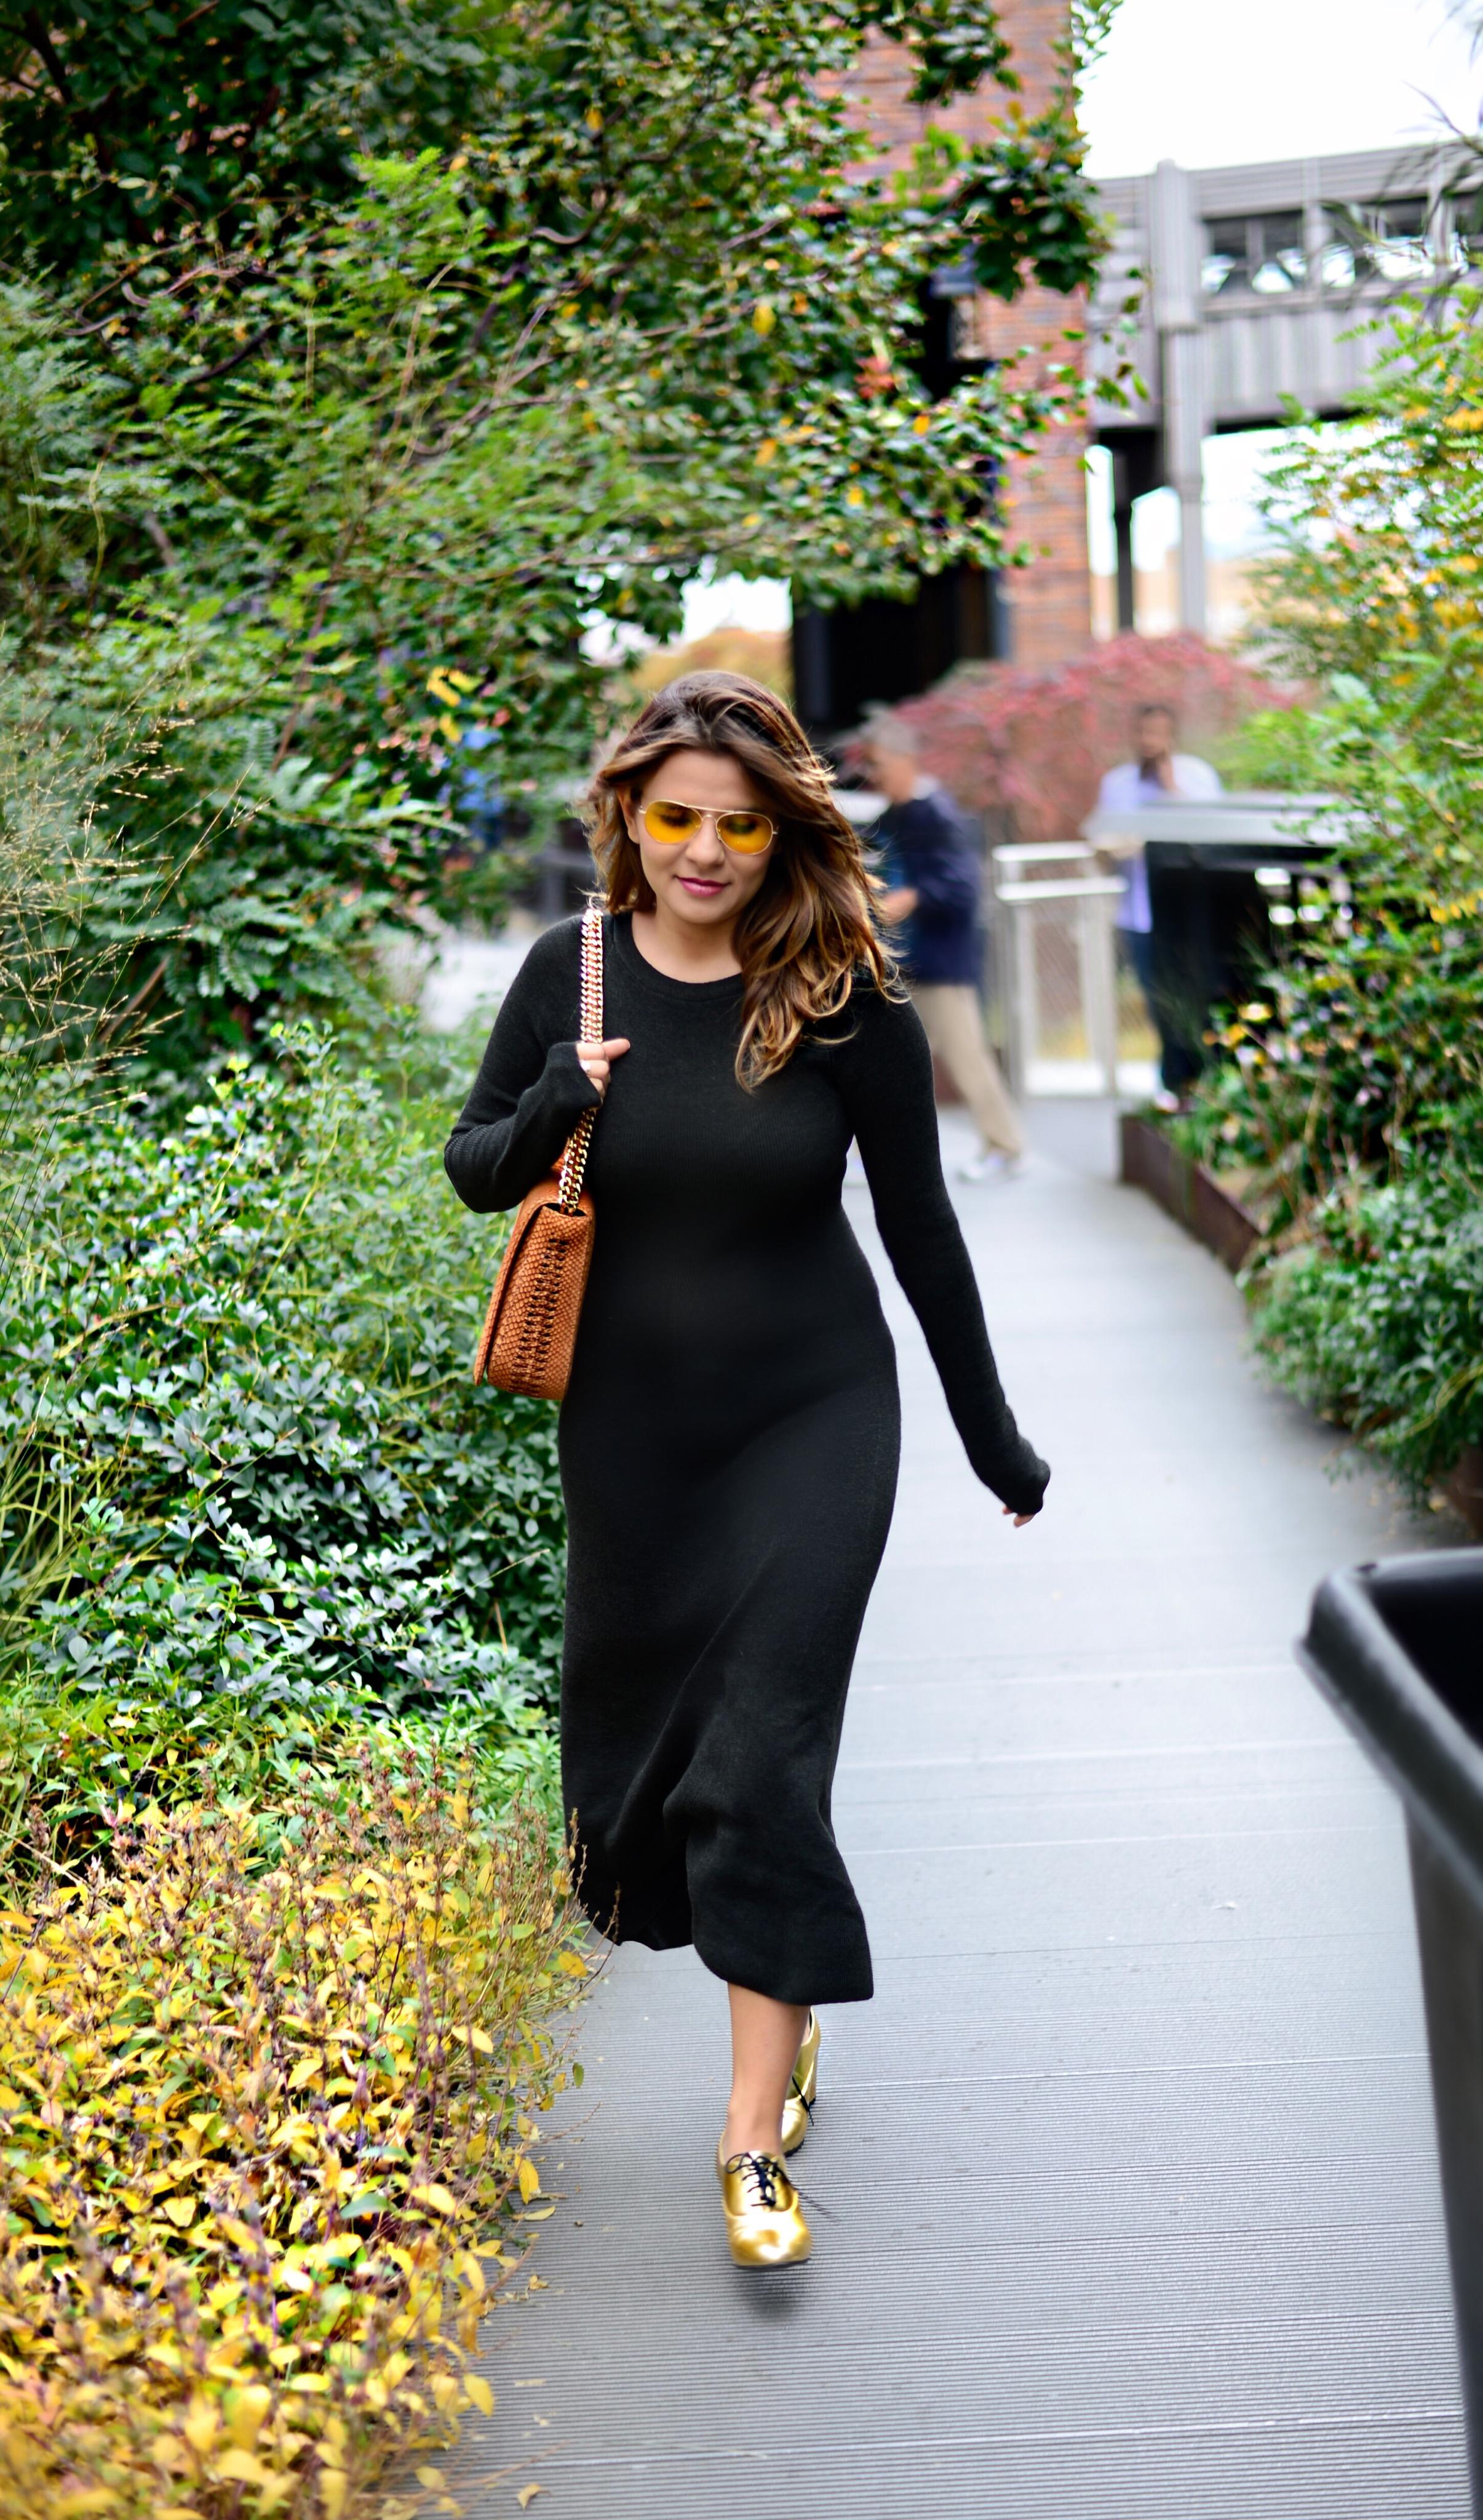 jersey-dress-gold-shoes-alley-girl-betul-yildiz-new-york-fashion-blogger-14